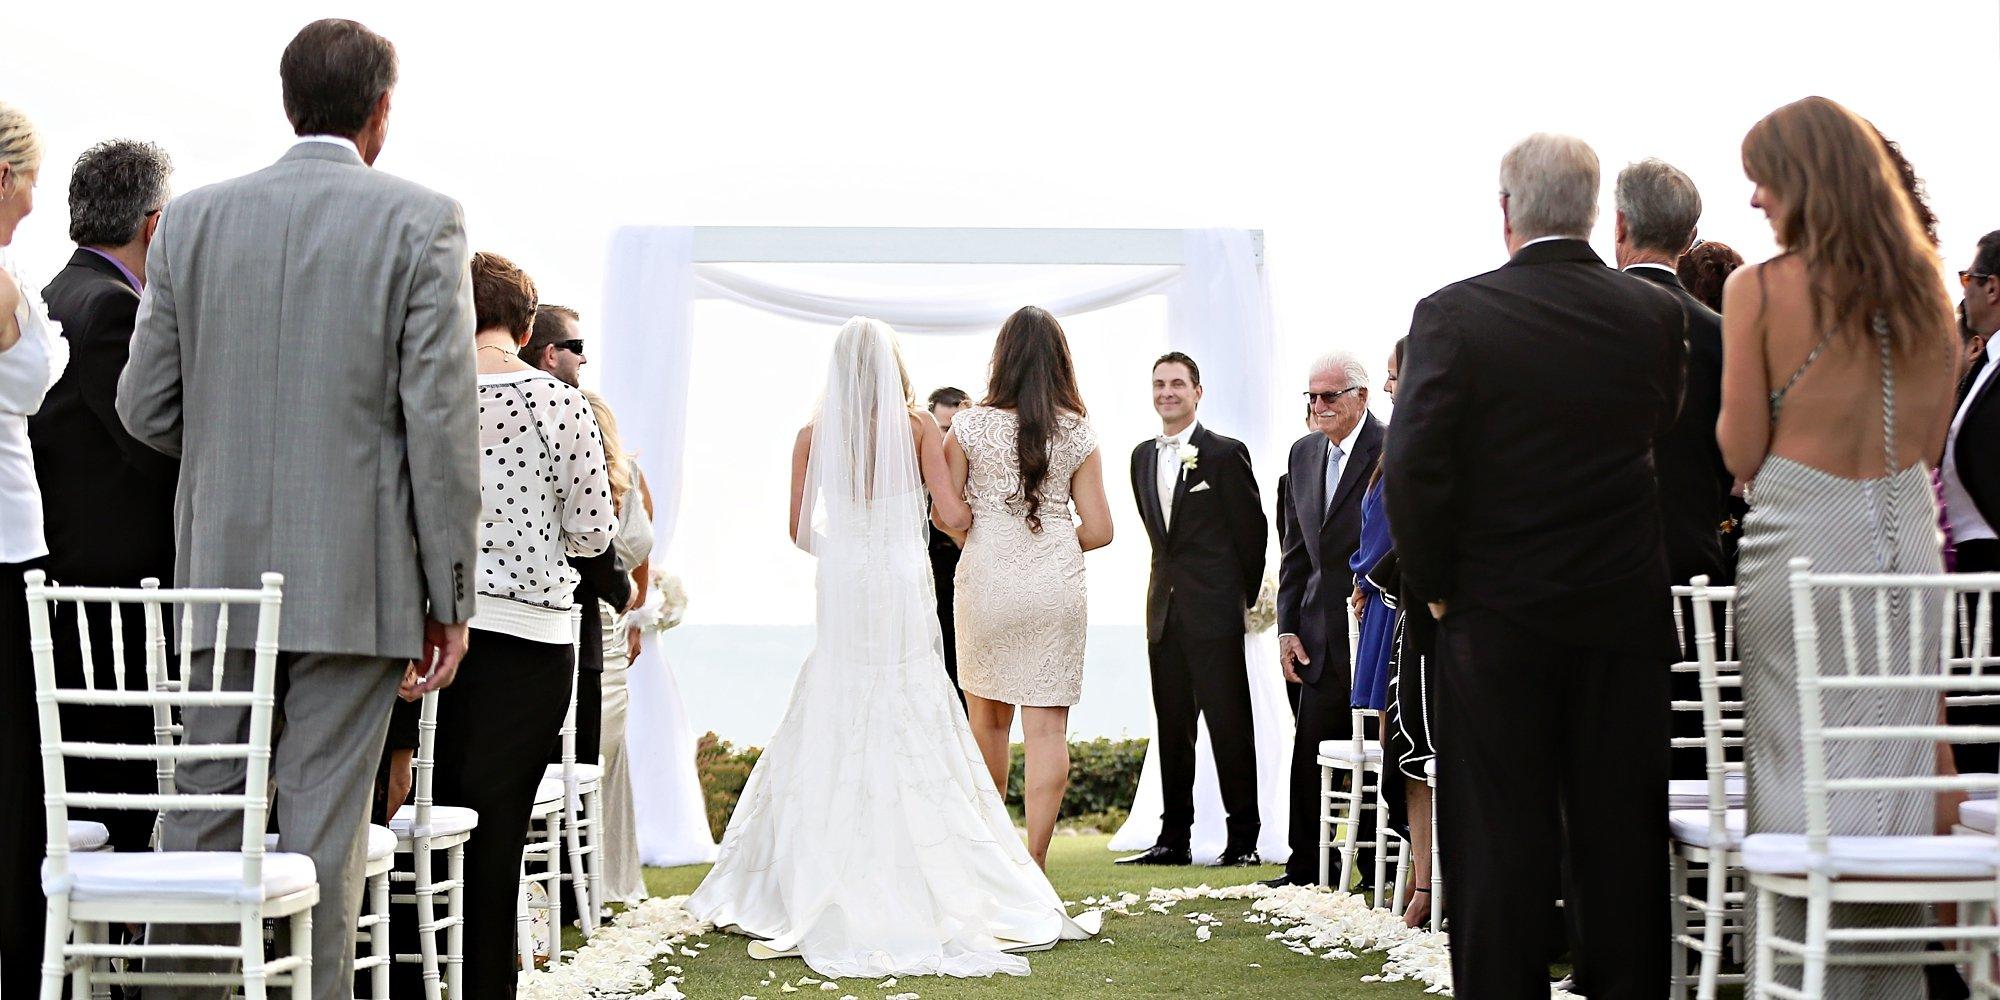 Laguna Beach Montage wedding Glenn and Michelle-Carats and cake resize-0041.jpg